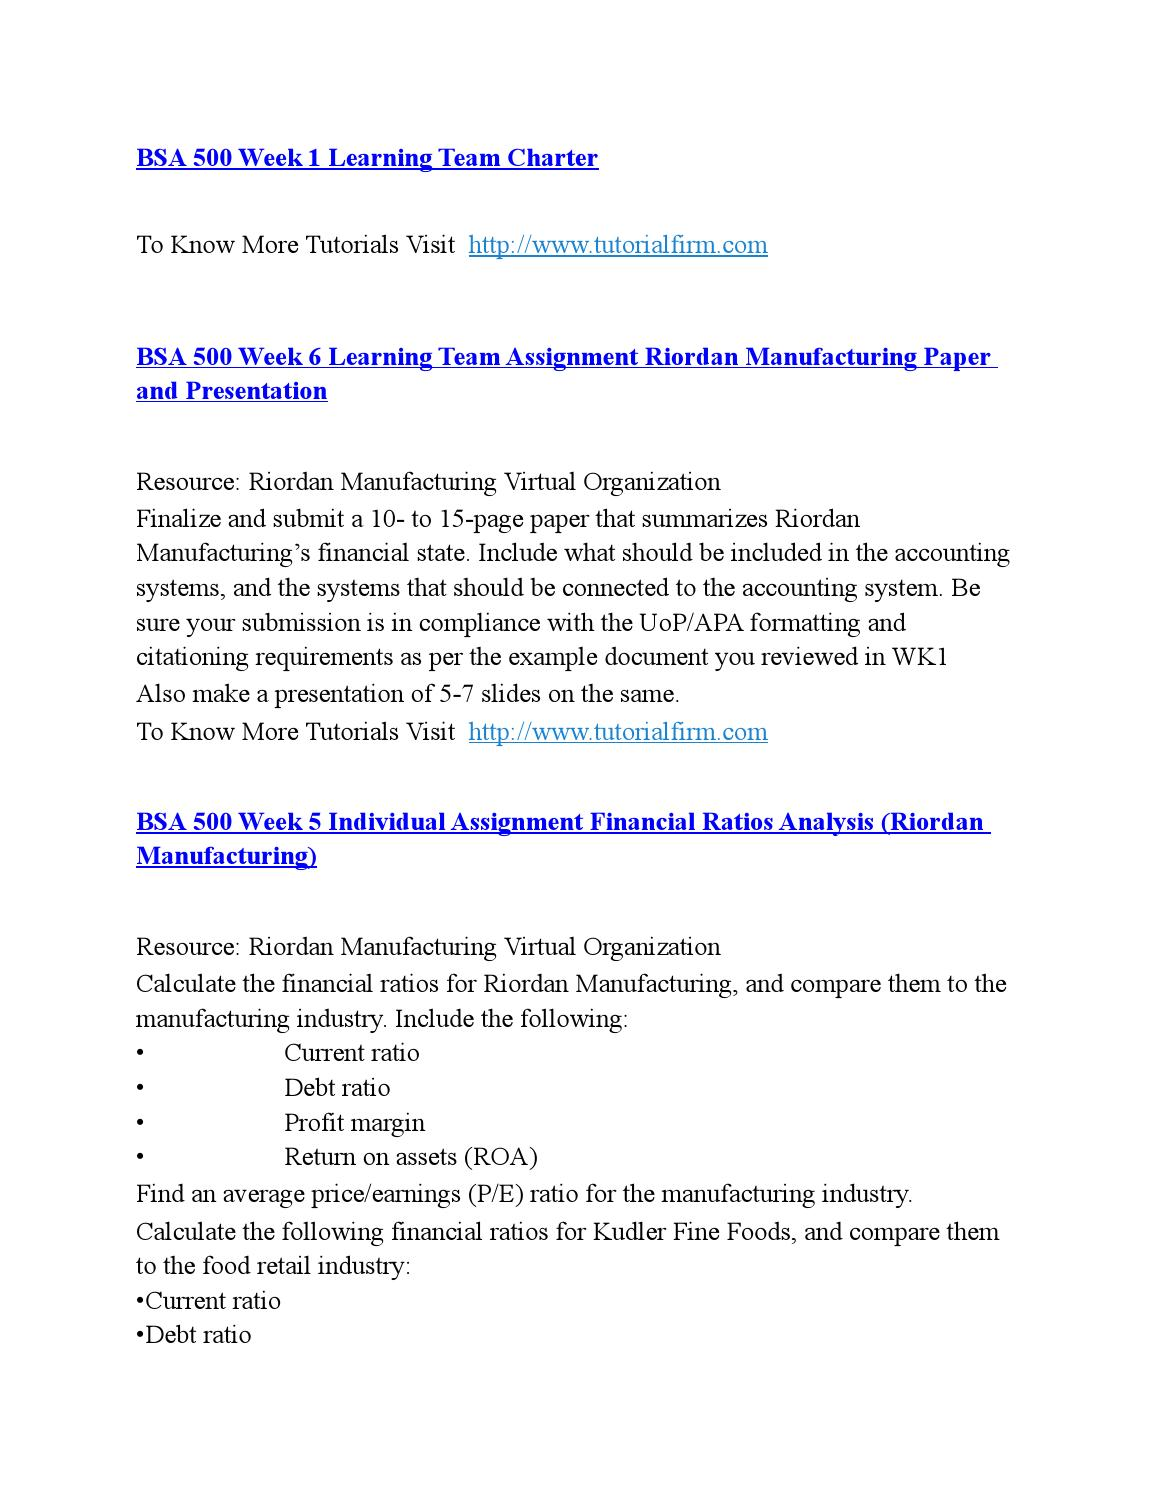 virtual organization strategy paper riordan manufacturing Resources: riordan manufacturing virtual strategy and business analysis riordan manufacturing virtual organization located on your student web site.